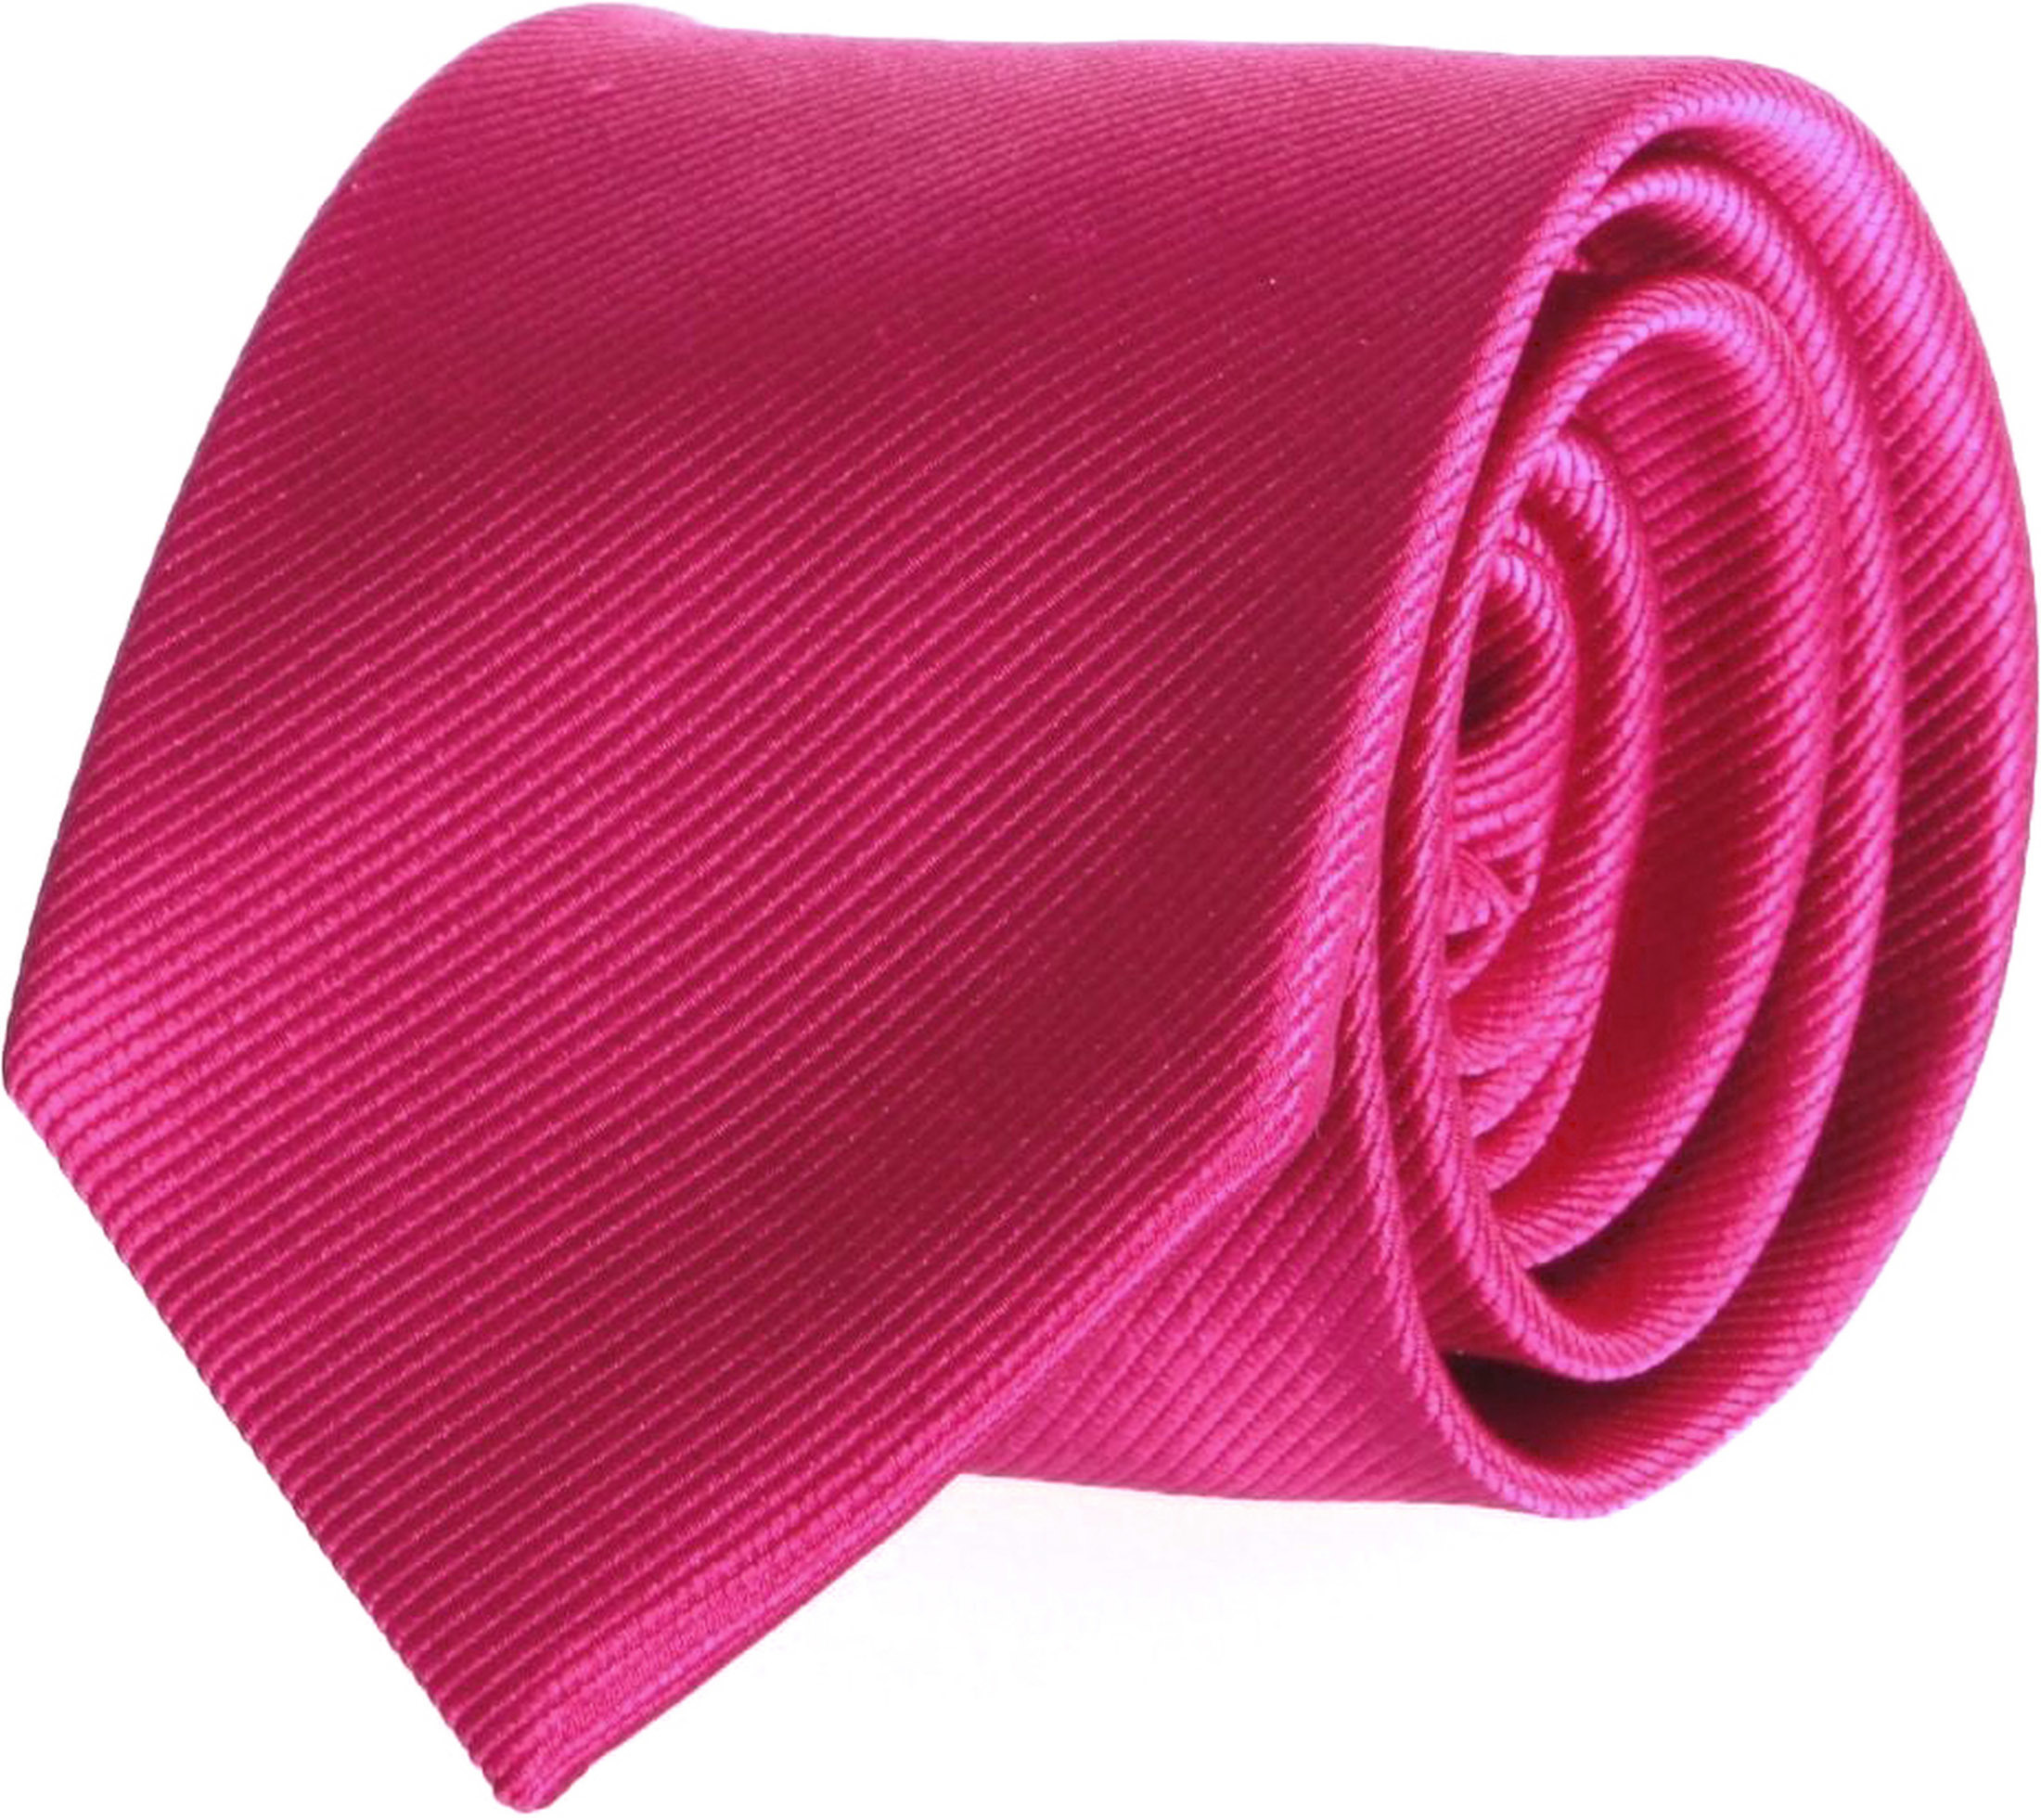 Krawatte Seide Dunkel Fuchsia Uni F66